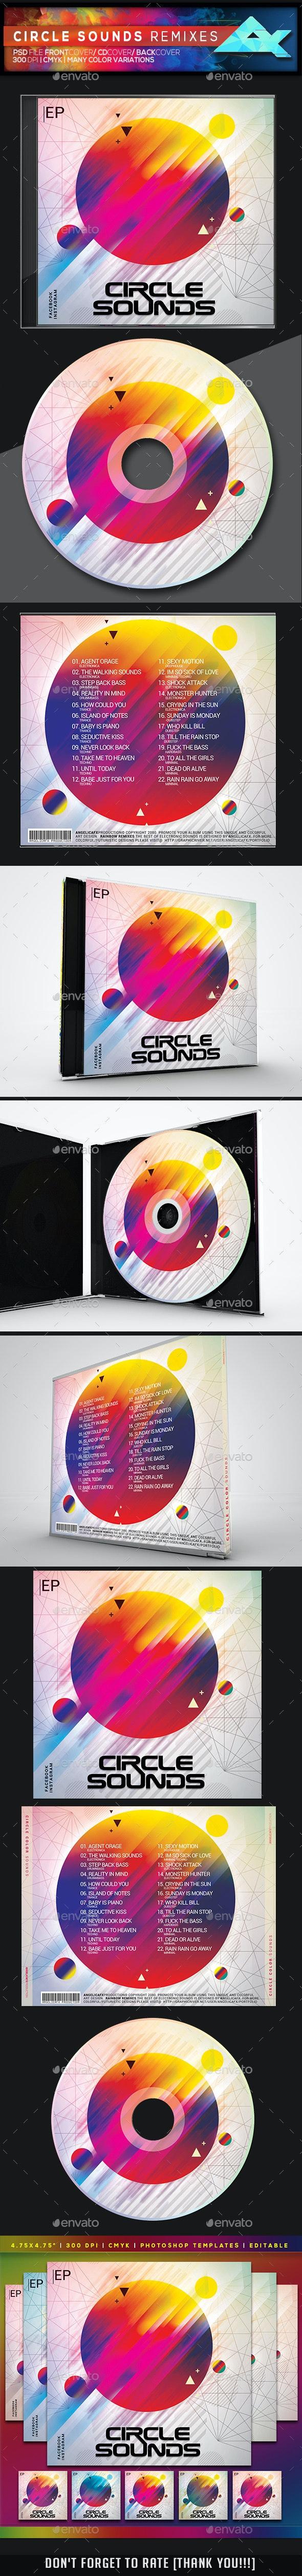 Circle Colorful Sounds CD/DVD Photoshop Template - CD & DVD Artwork Print Templates